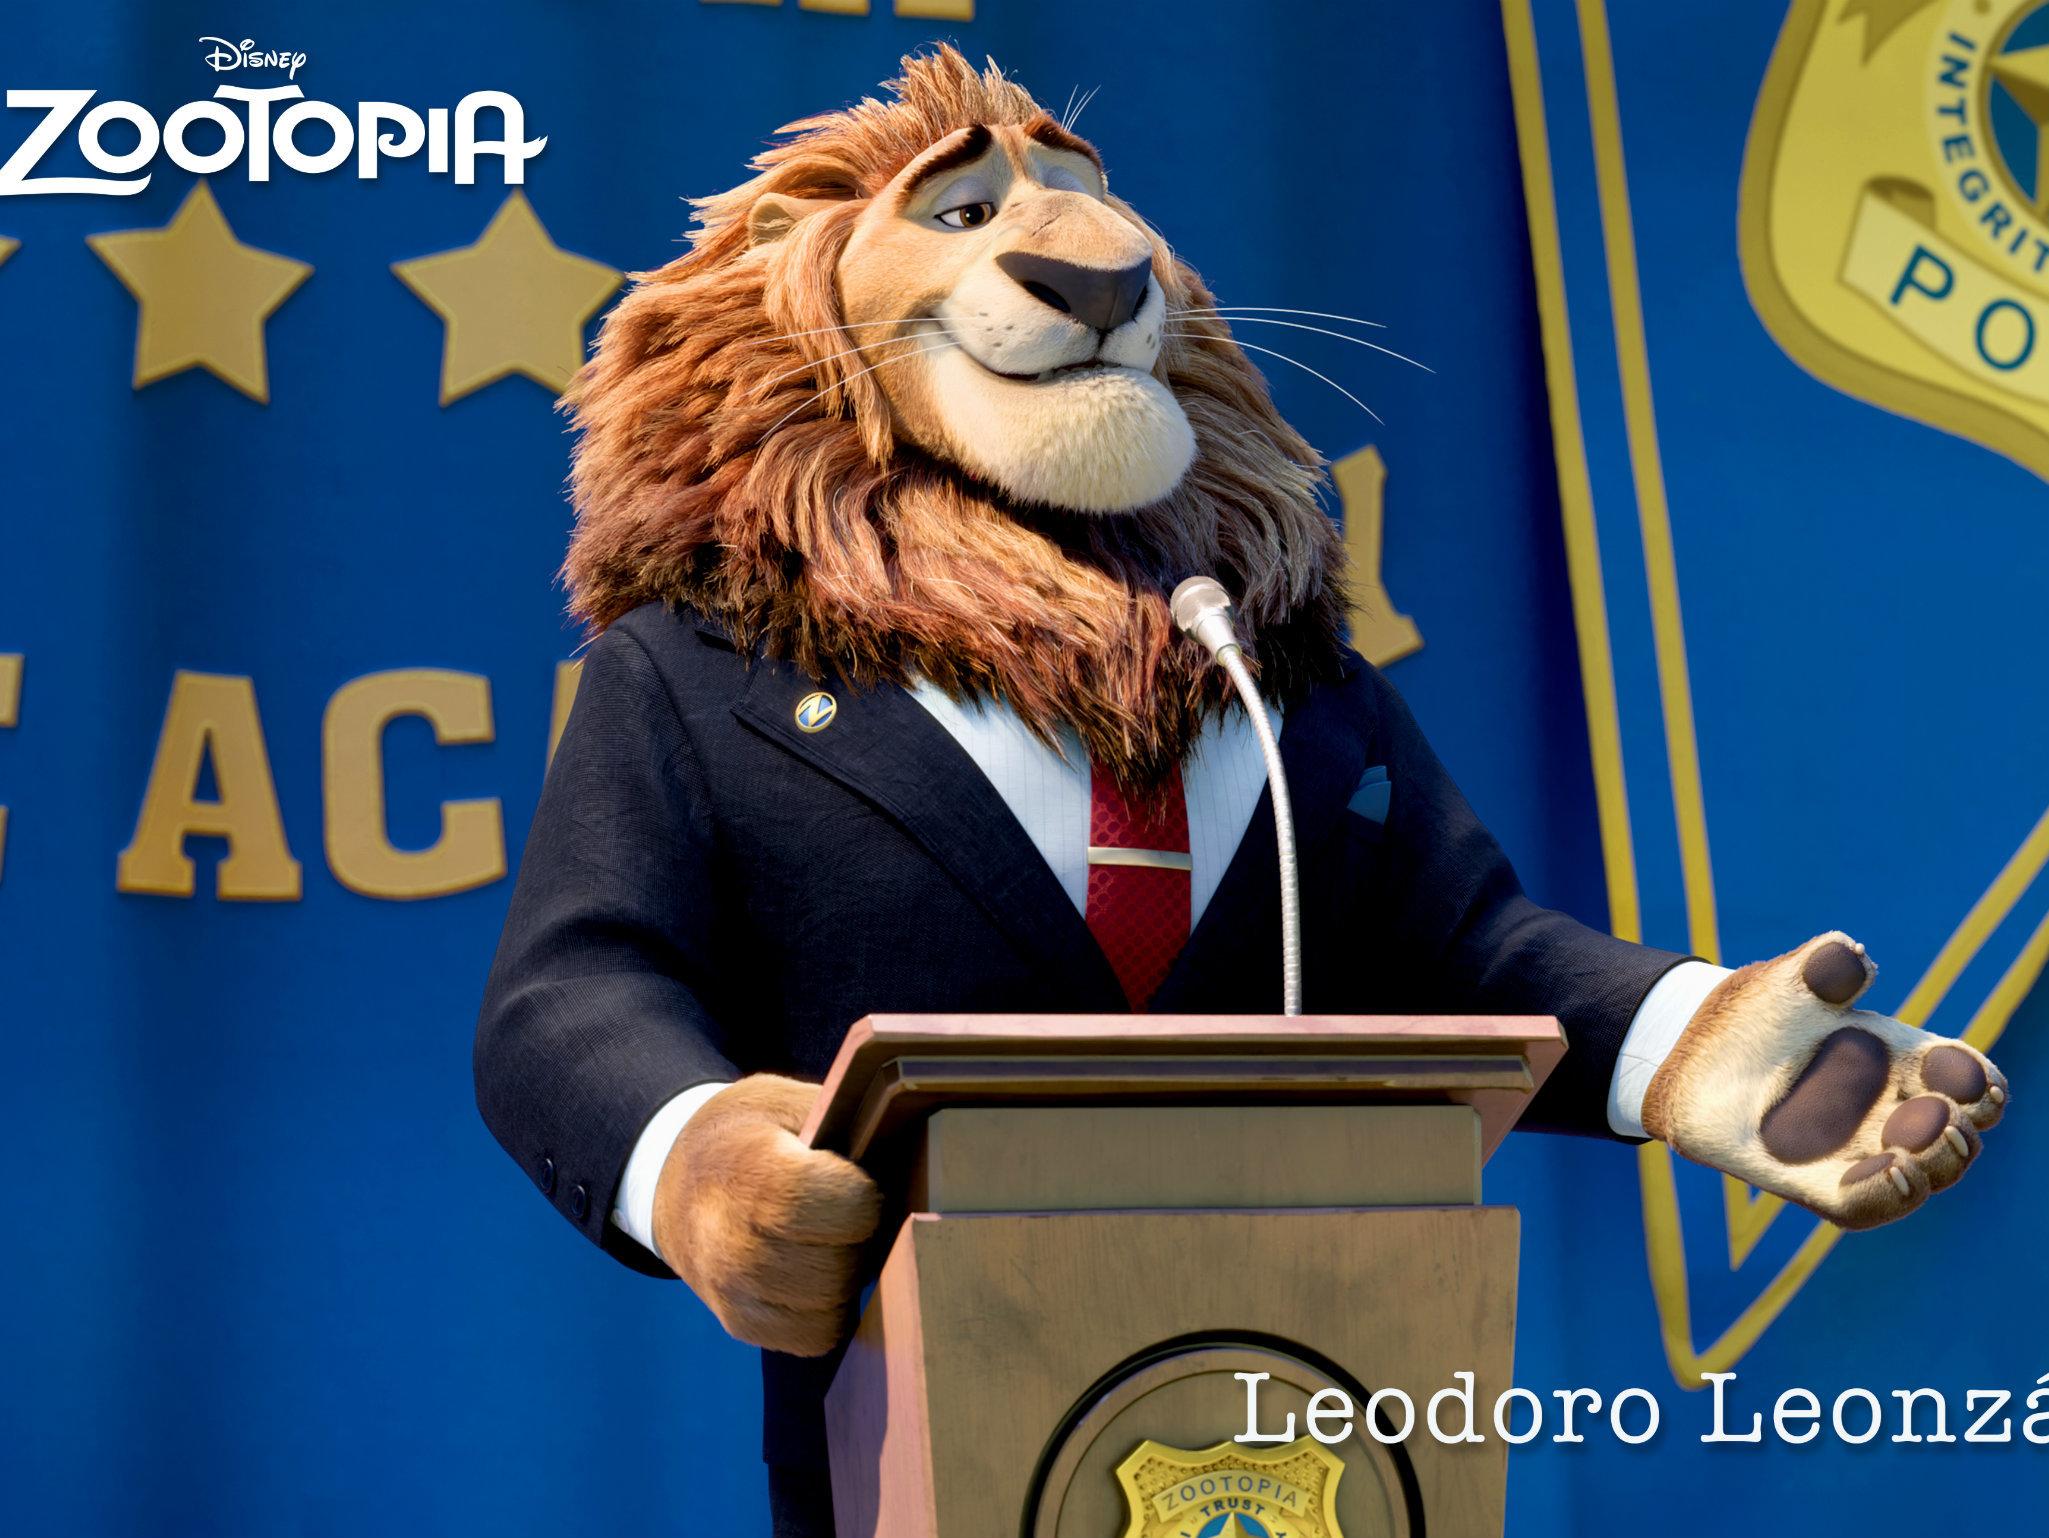 Alcalde Leodore Lionheart